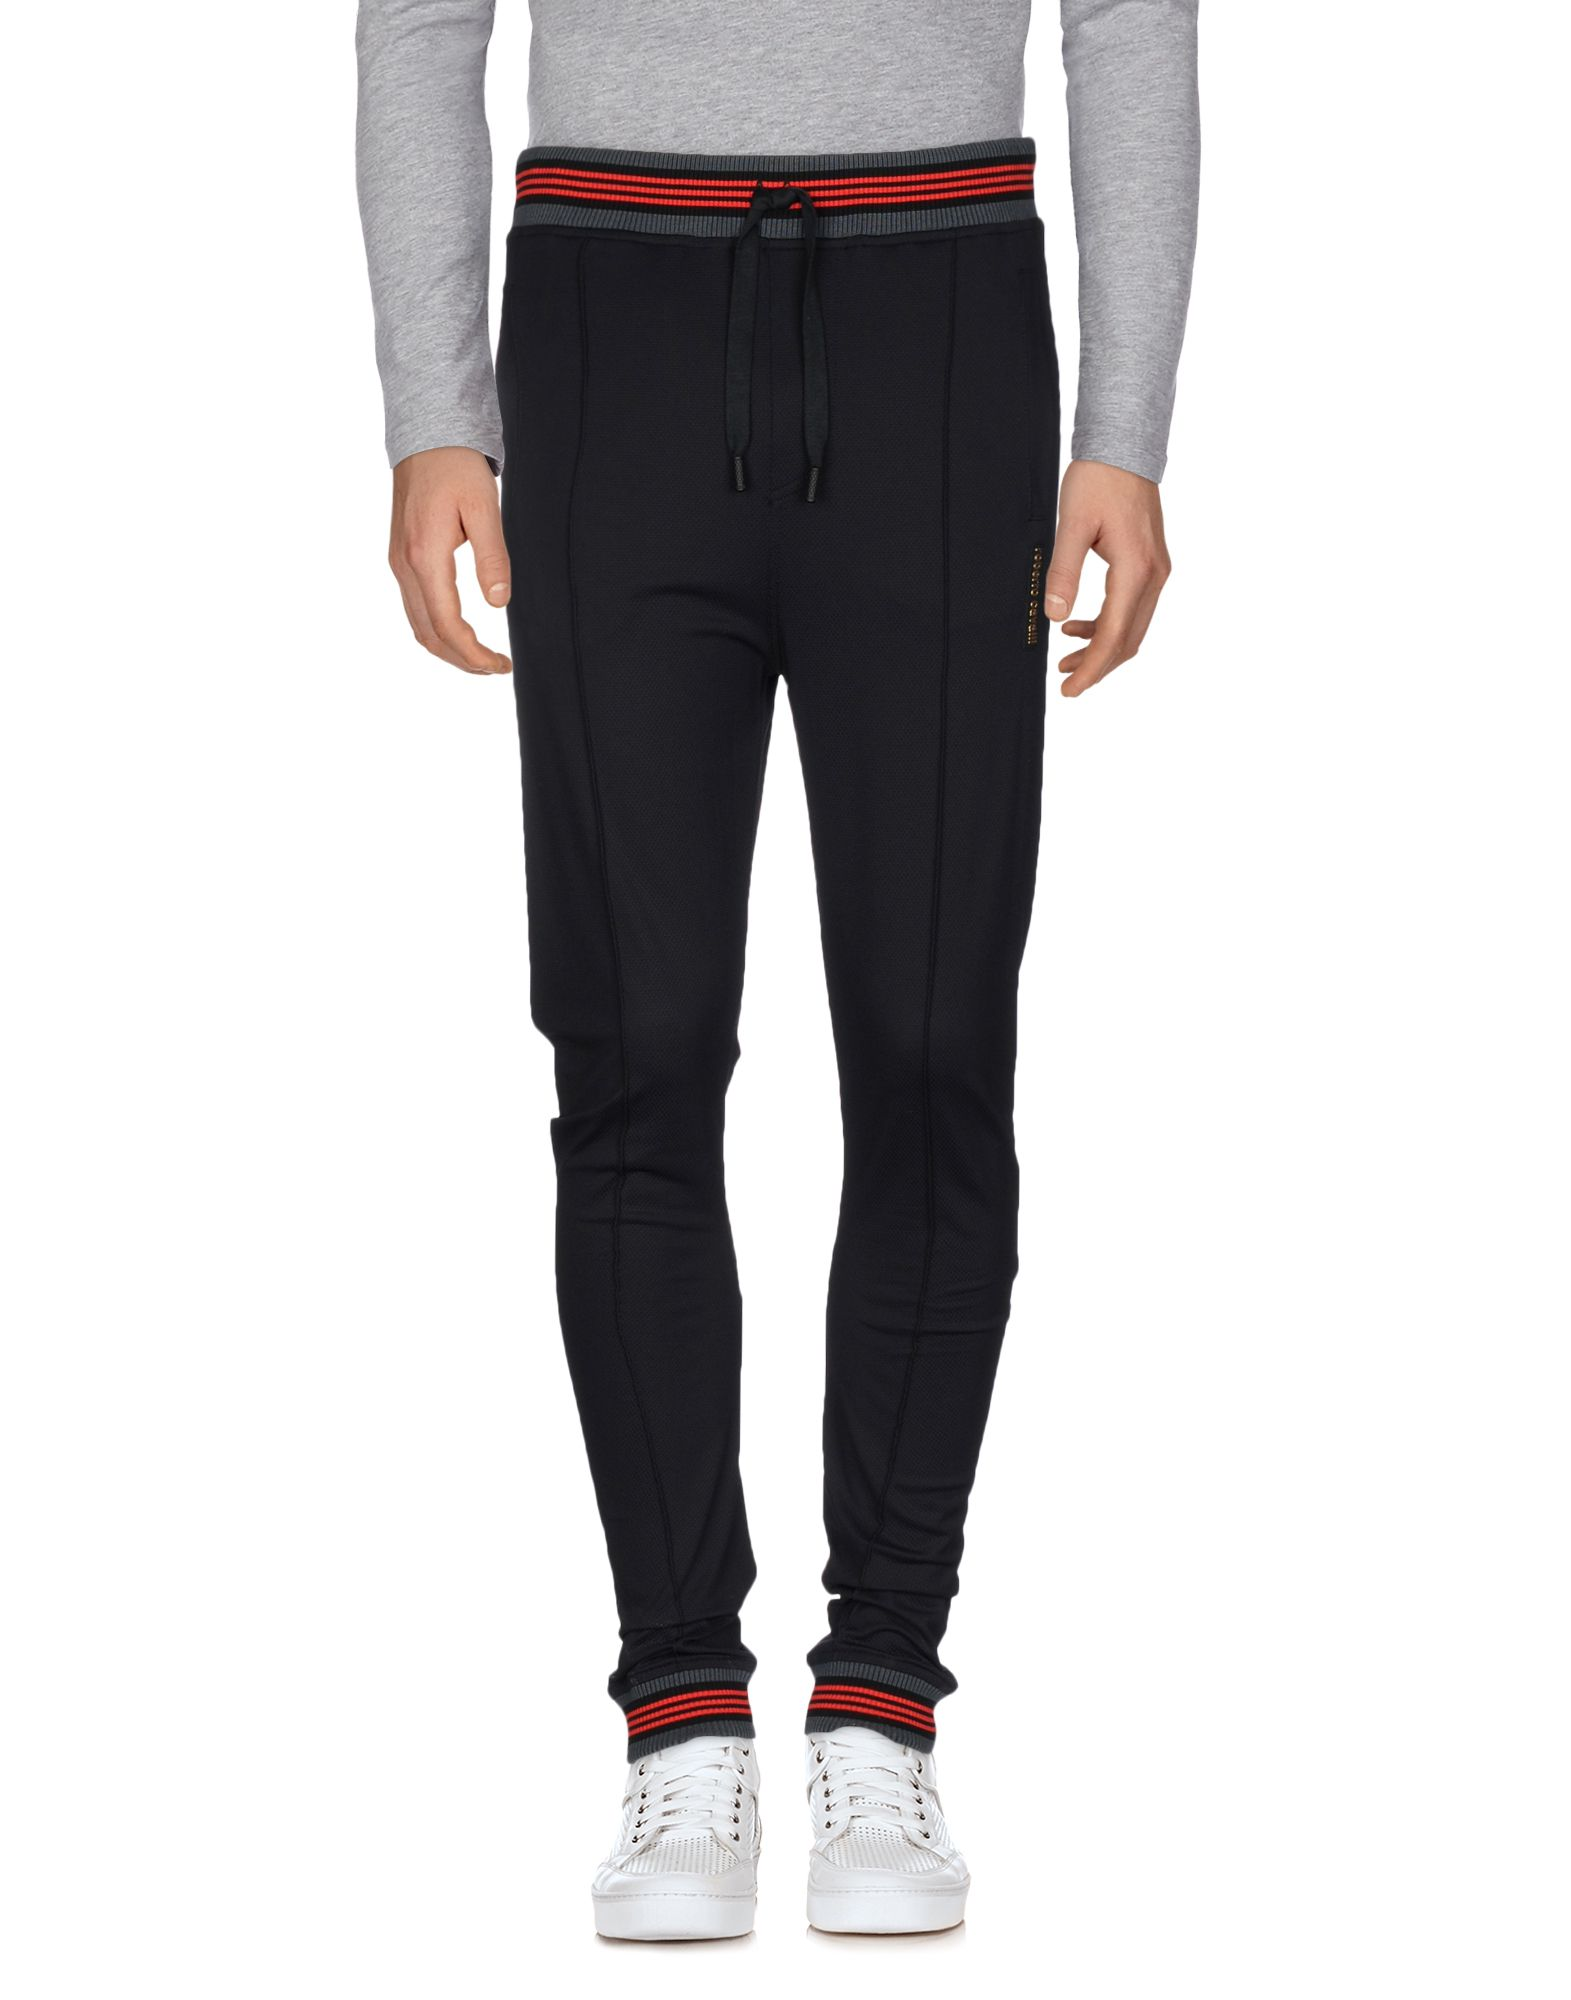 Pantalone Gym Roberto Cavalli Gym Pantalone Uomo - 13111302WU fed717